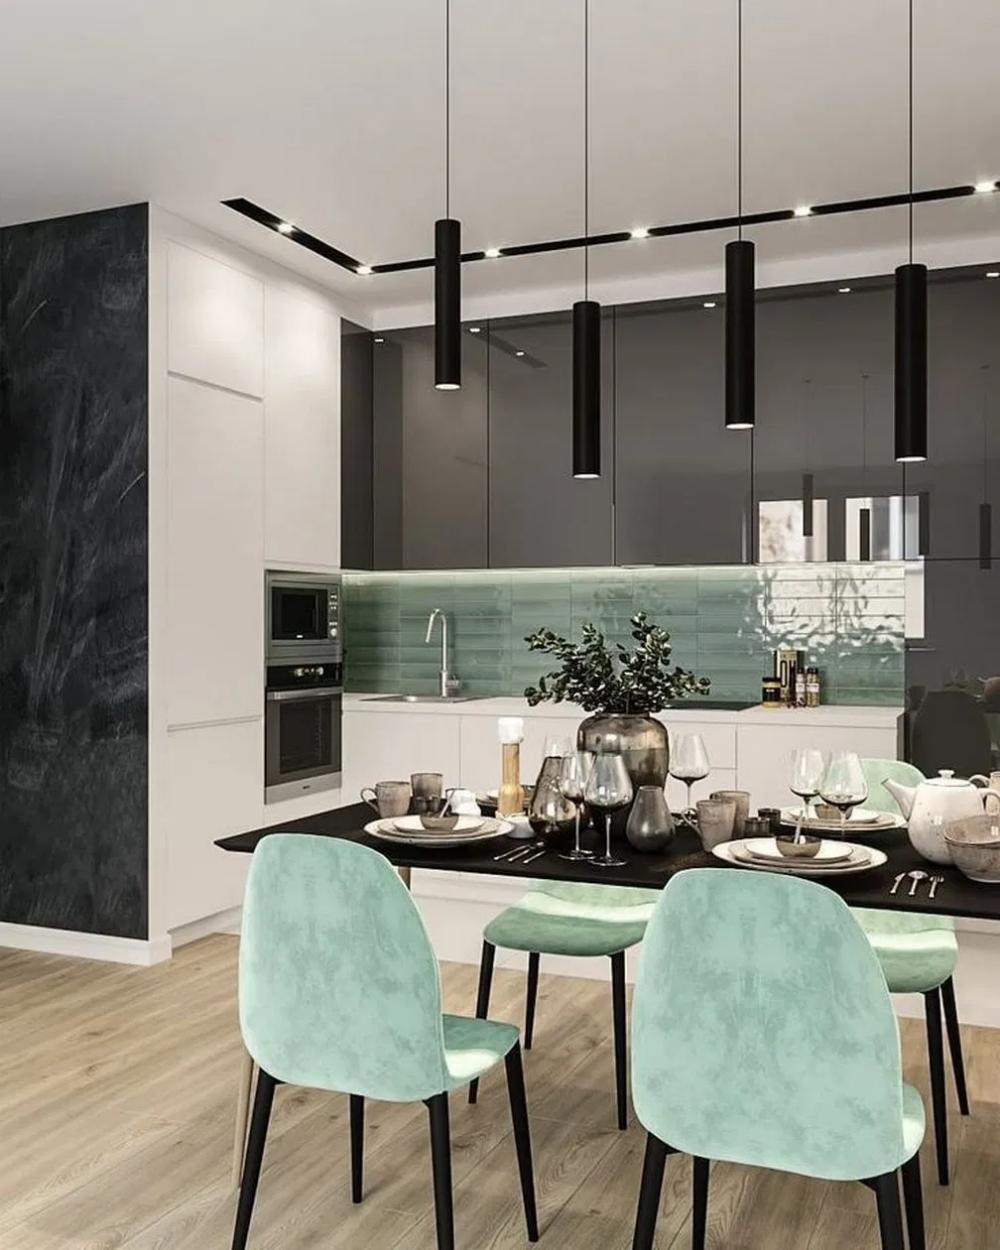 23 Luxurious Dining Room Design Ideas That Looks Awesome 18 Lumbung Batu Com Modern Kitchen Design Home Decor Kitchen Interior Design Kitchen